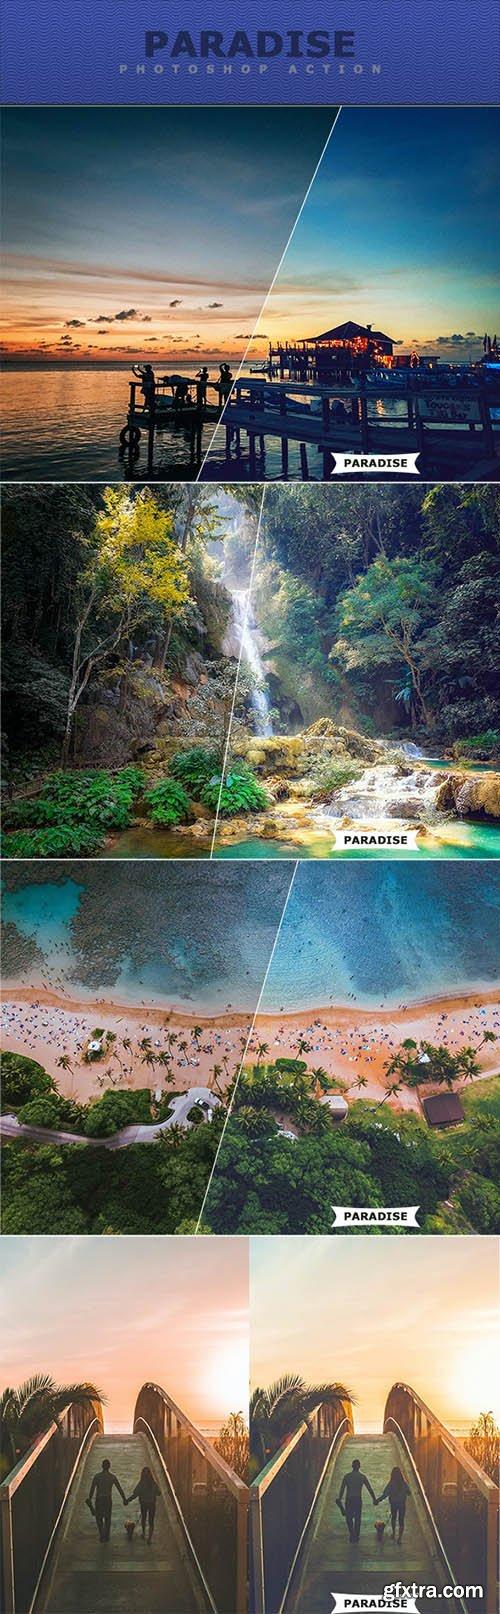 GraphicRiver - Paradise Photoshop Action 27717748